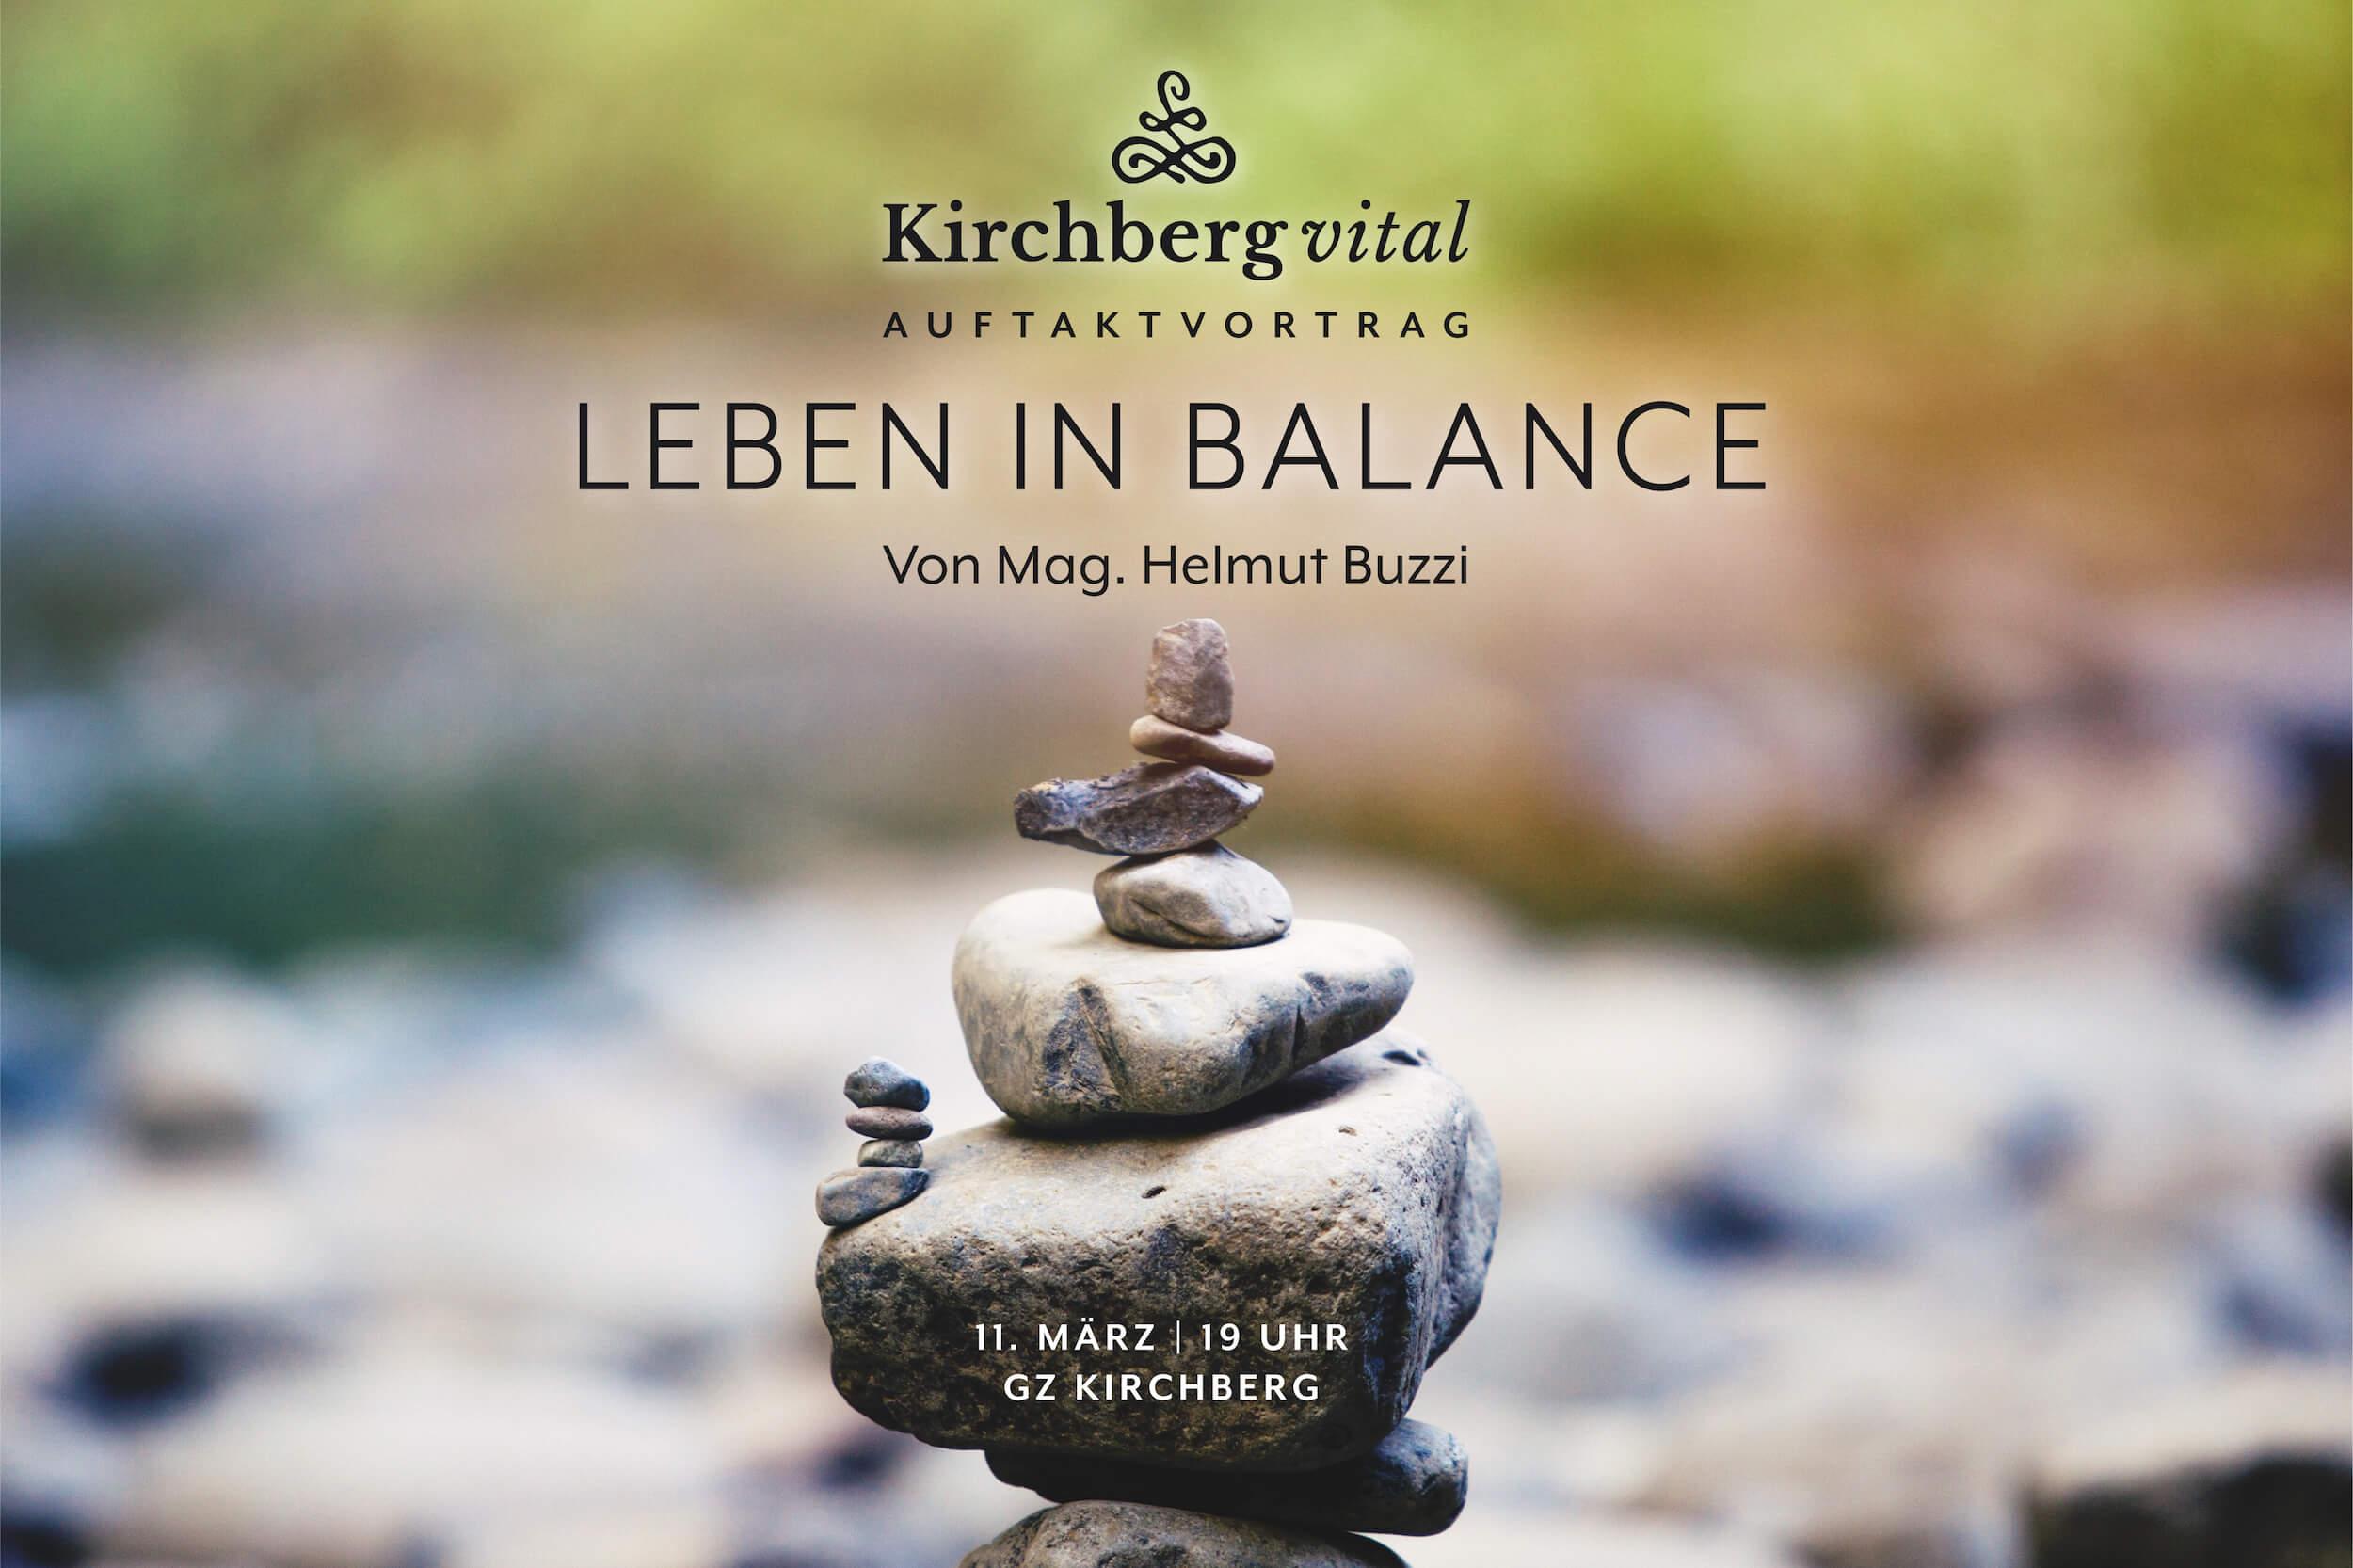 Leben-in-Balance-2_BANNER.jpg